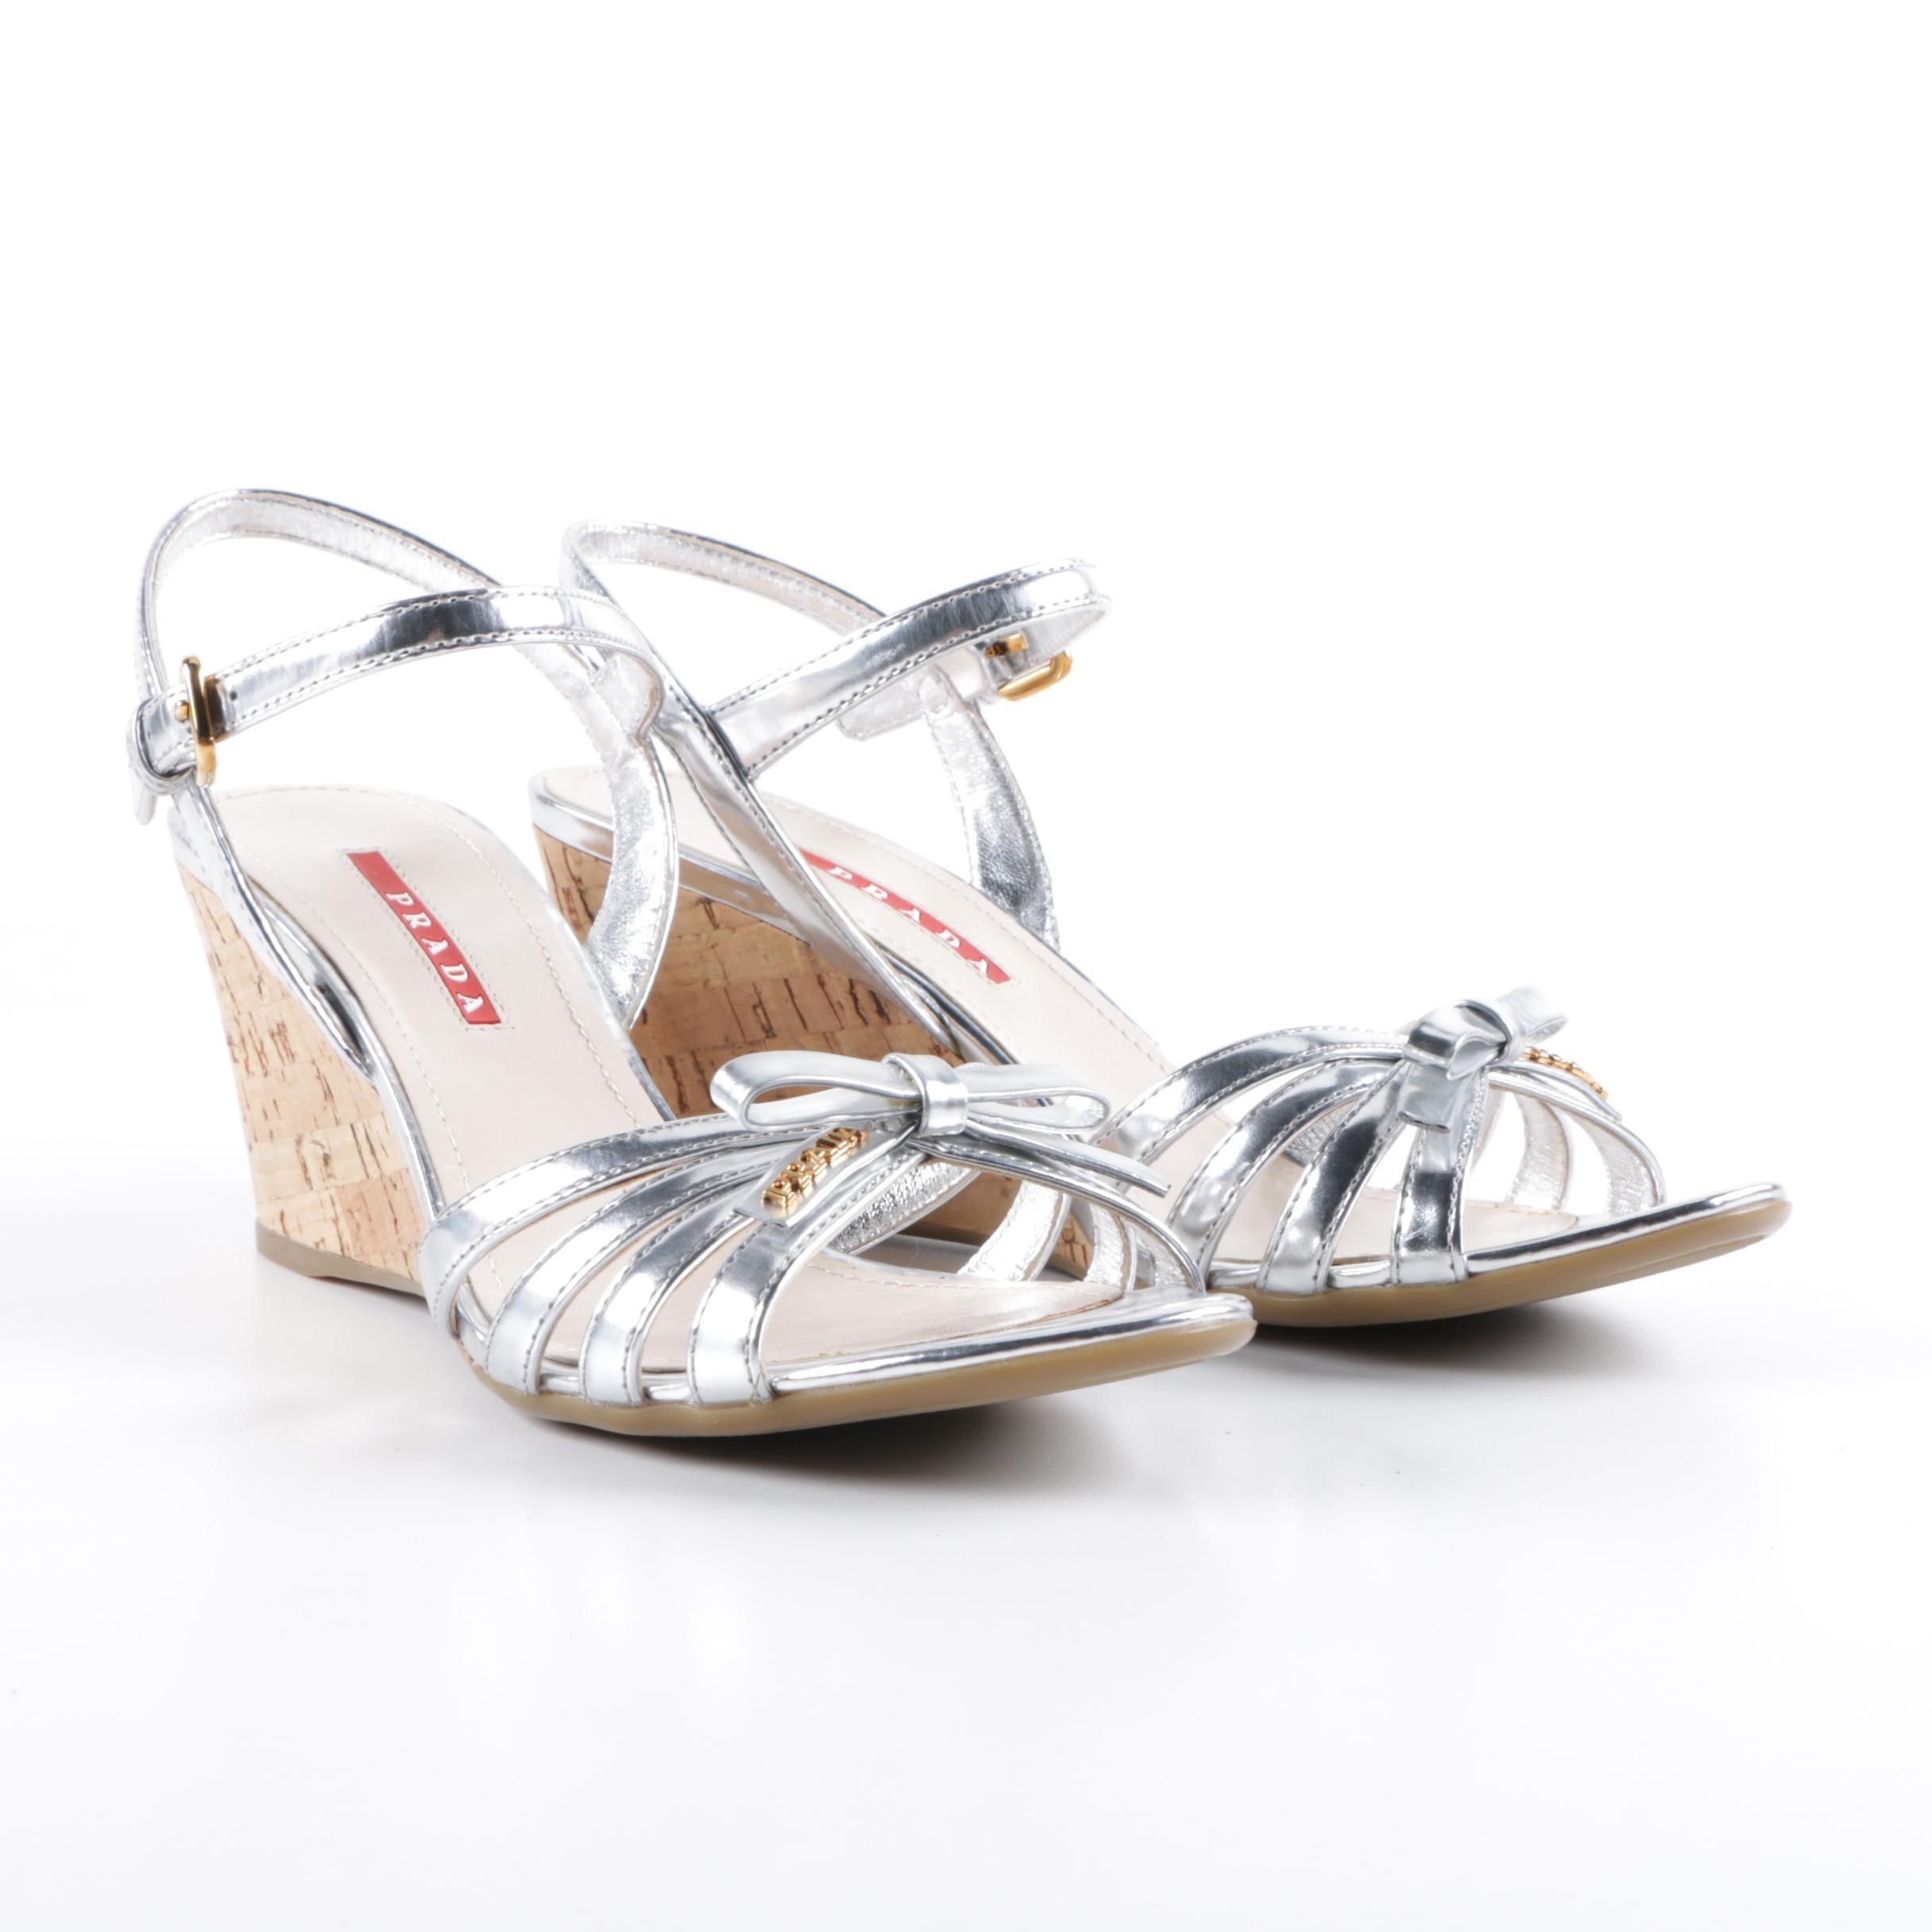 Prada Silver Metallic Leather and Cork Wedge Sandals